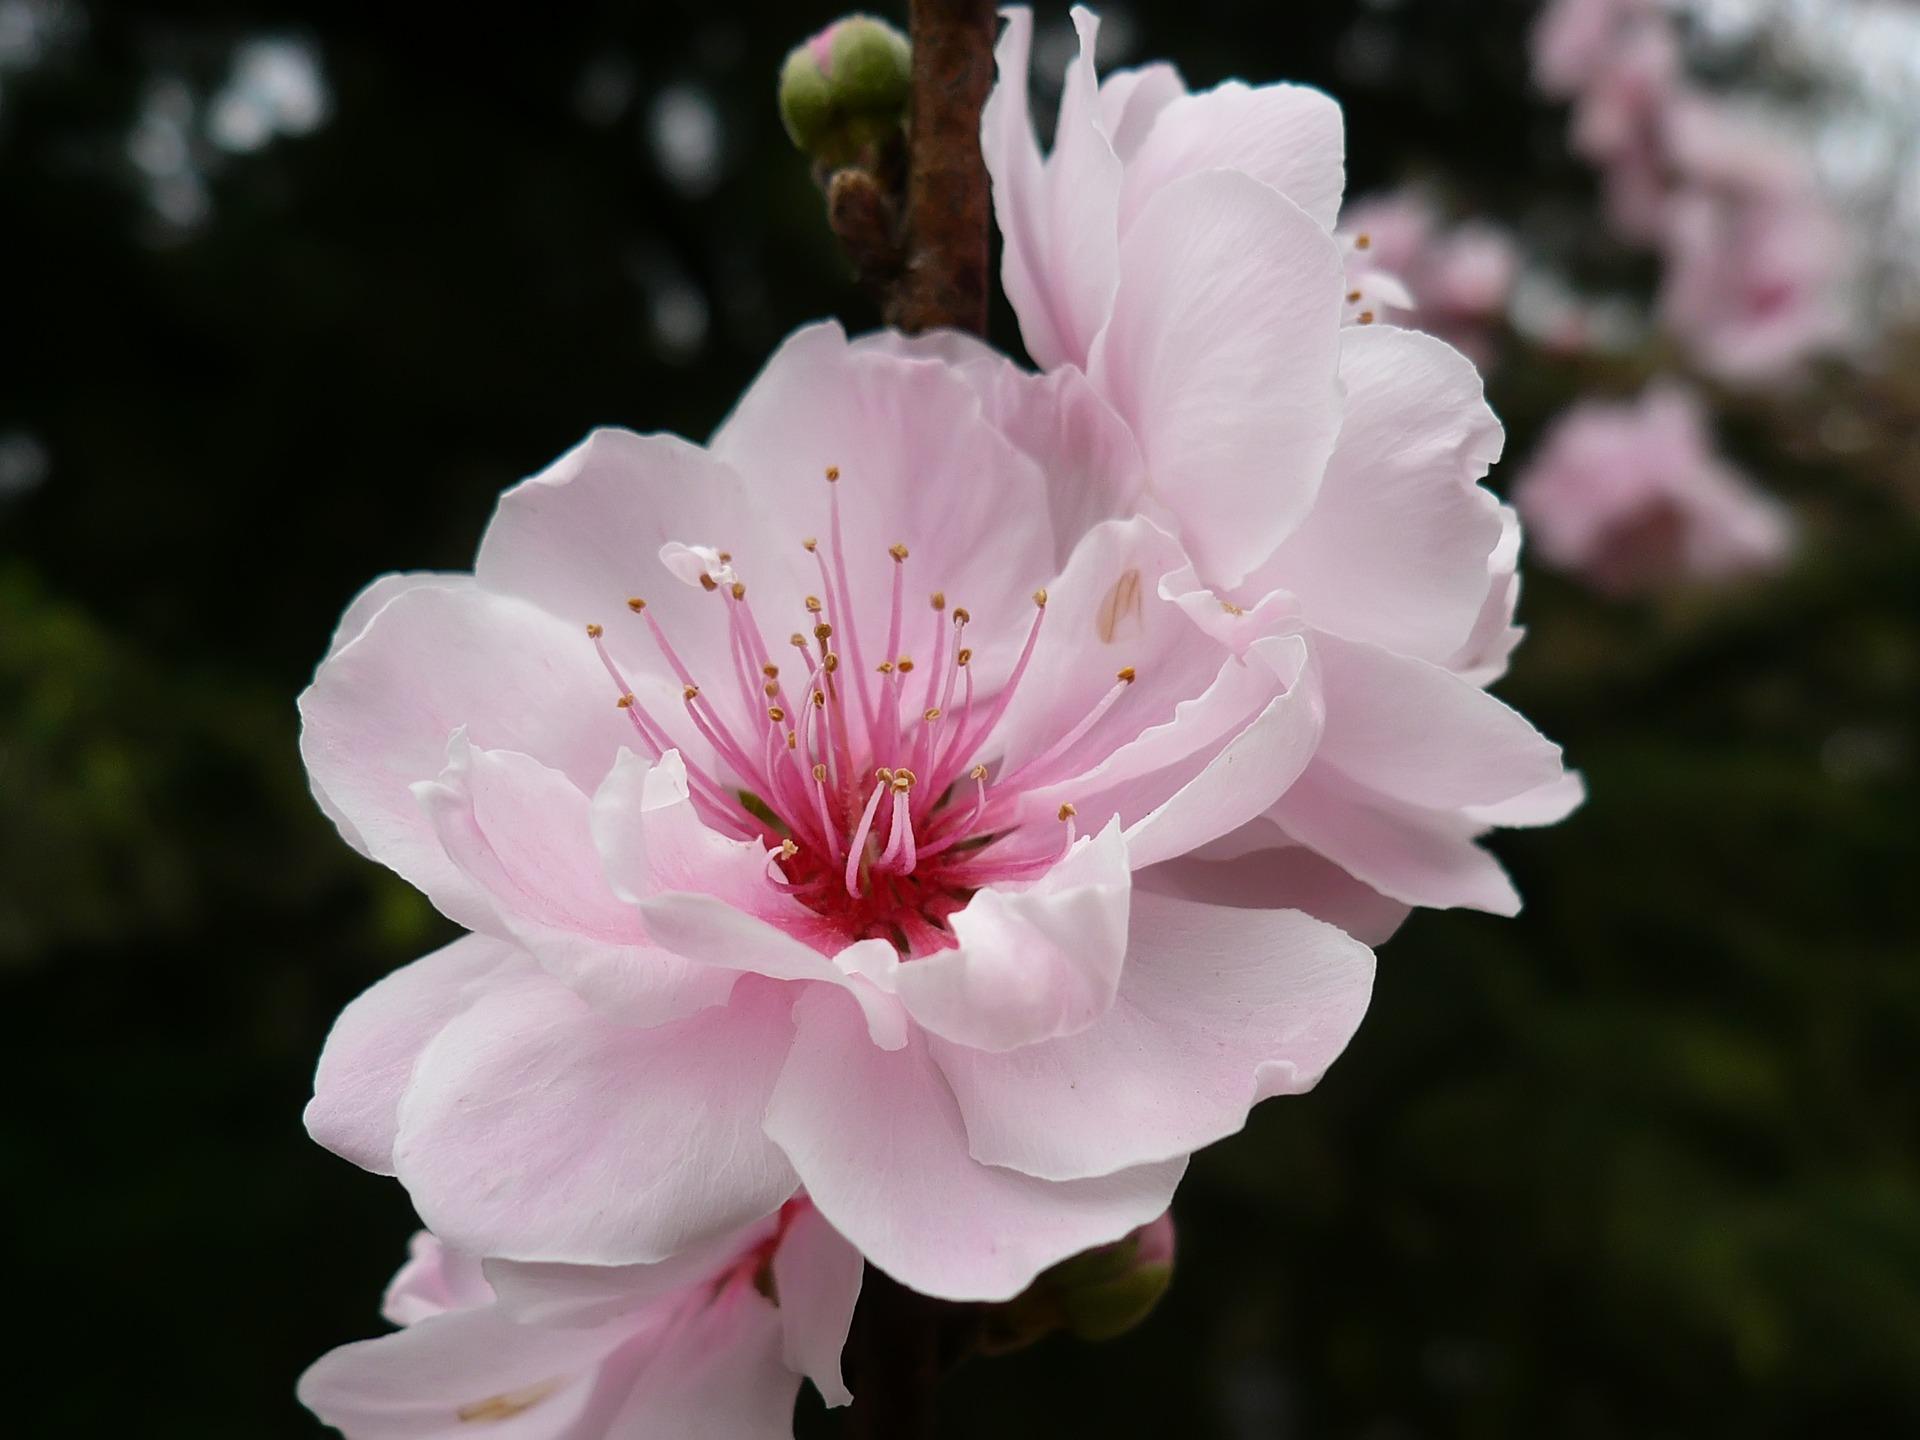 cherry flower wallpaper plants nature wallpapers in jpg format for